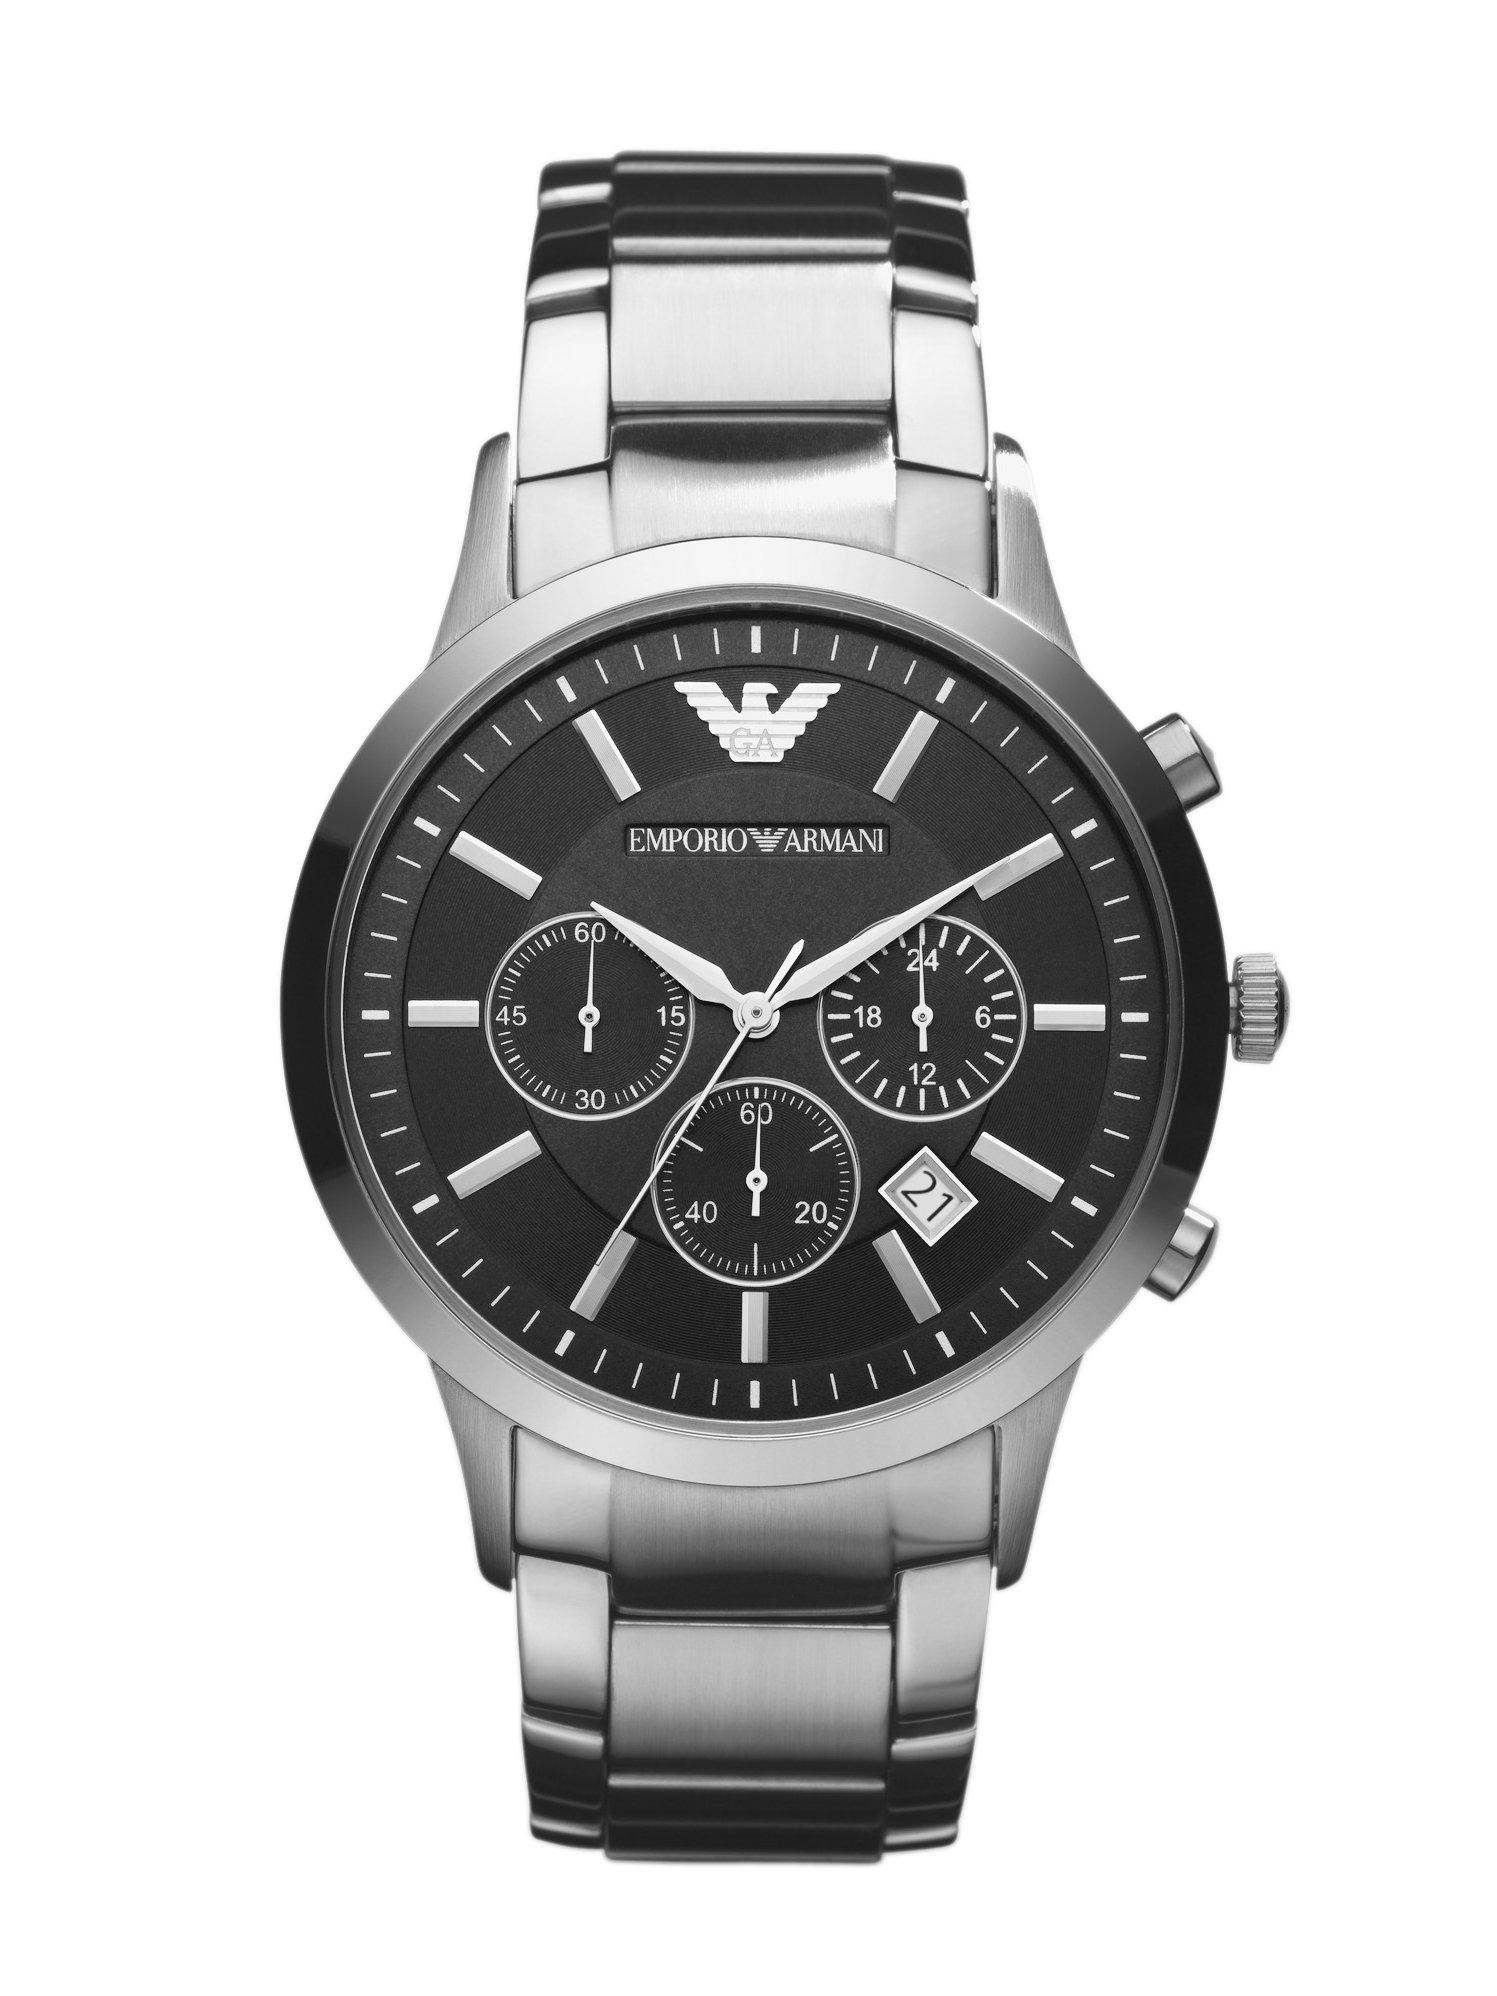 emporio armani classic chronograph watch in black for men. Black Bedroom Furniture Sets. Home Design Ideas